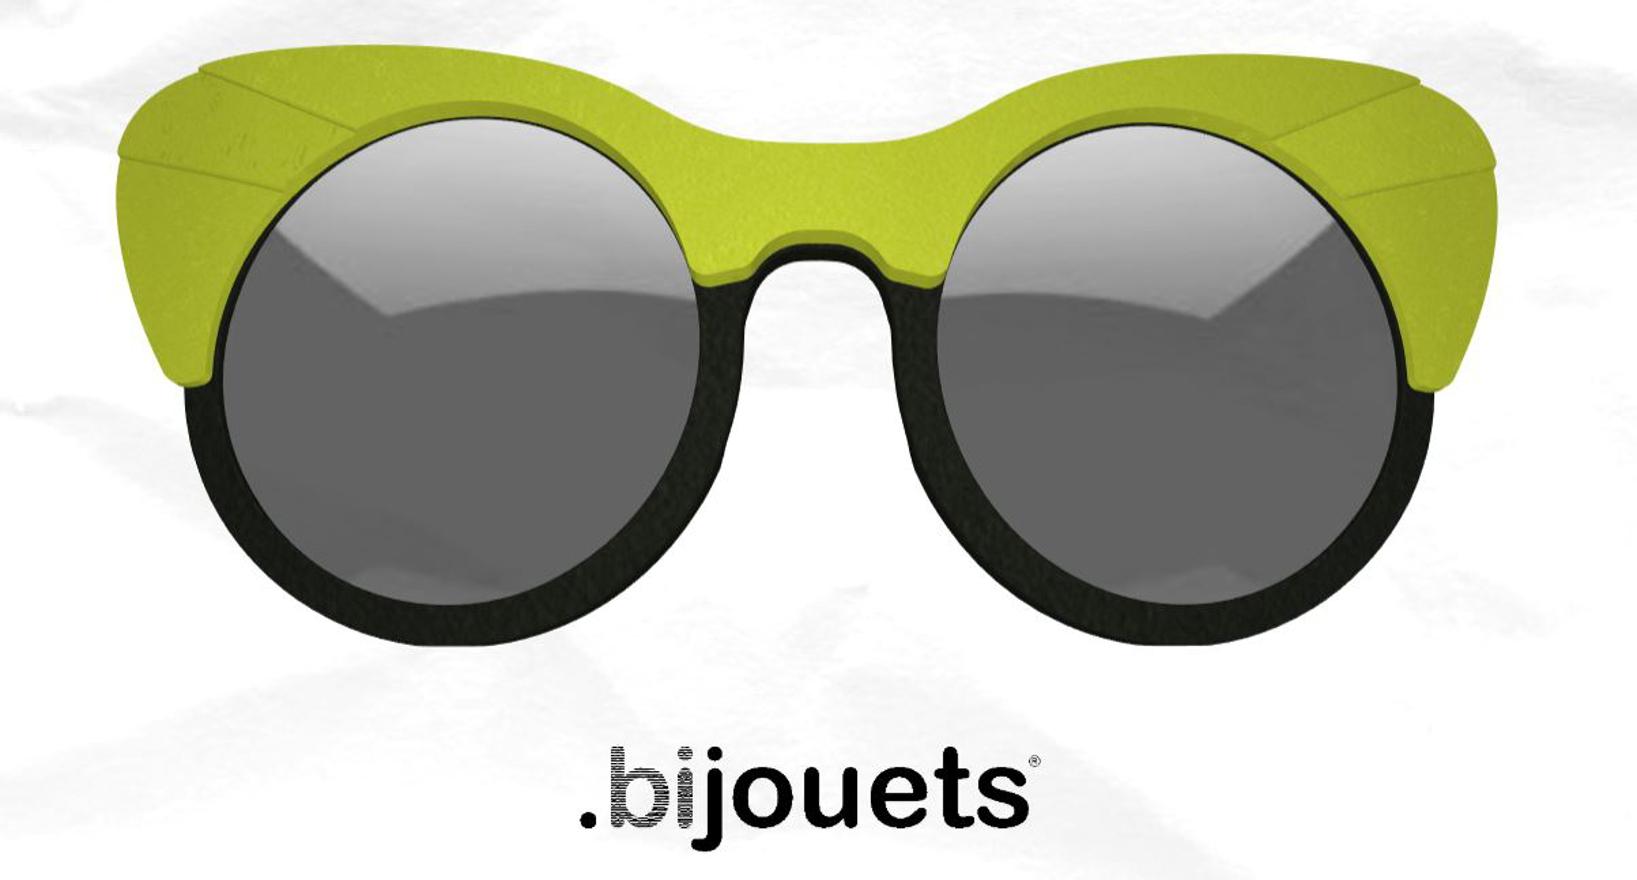 3D printed sunglasses Cambiami bijouets